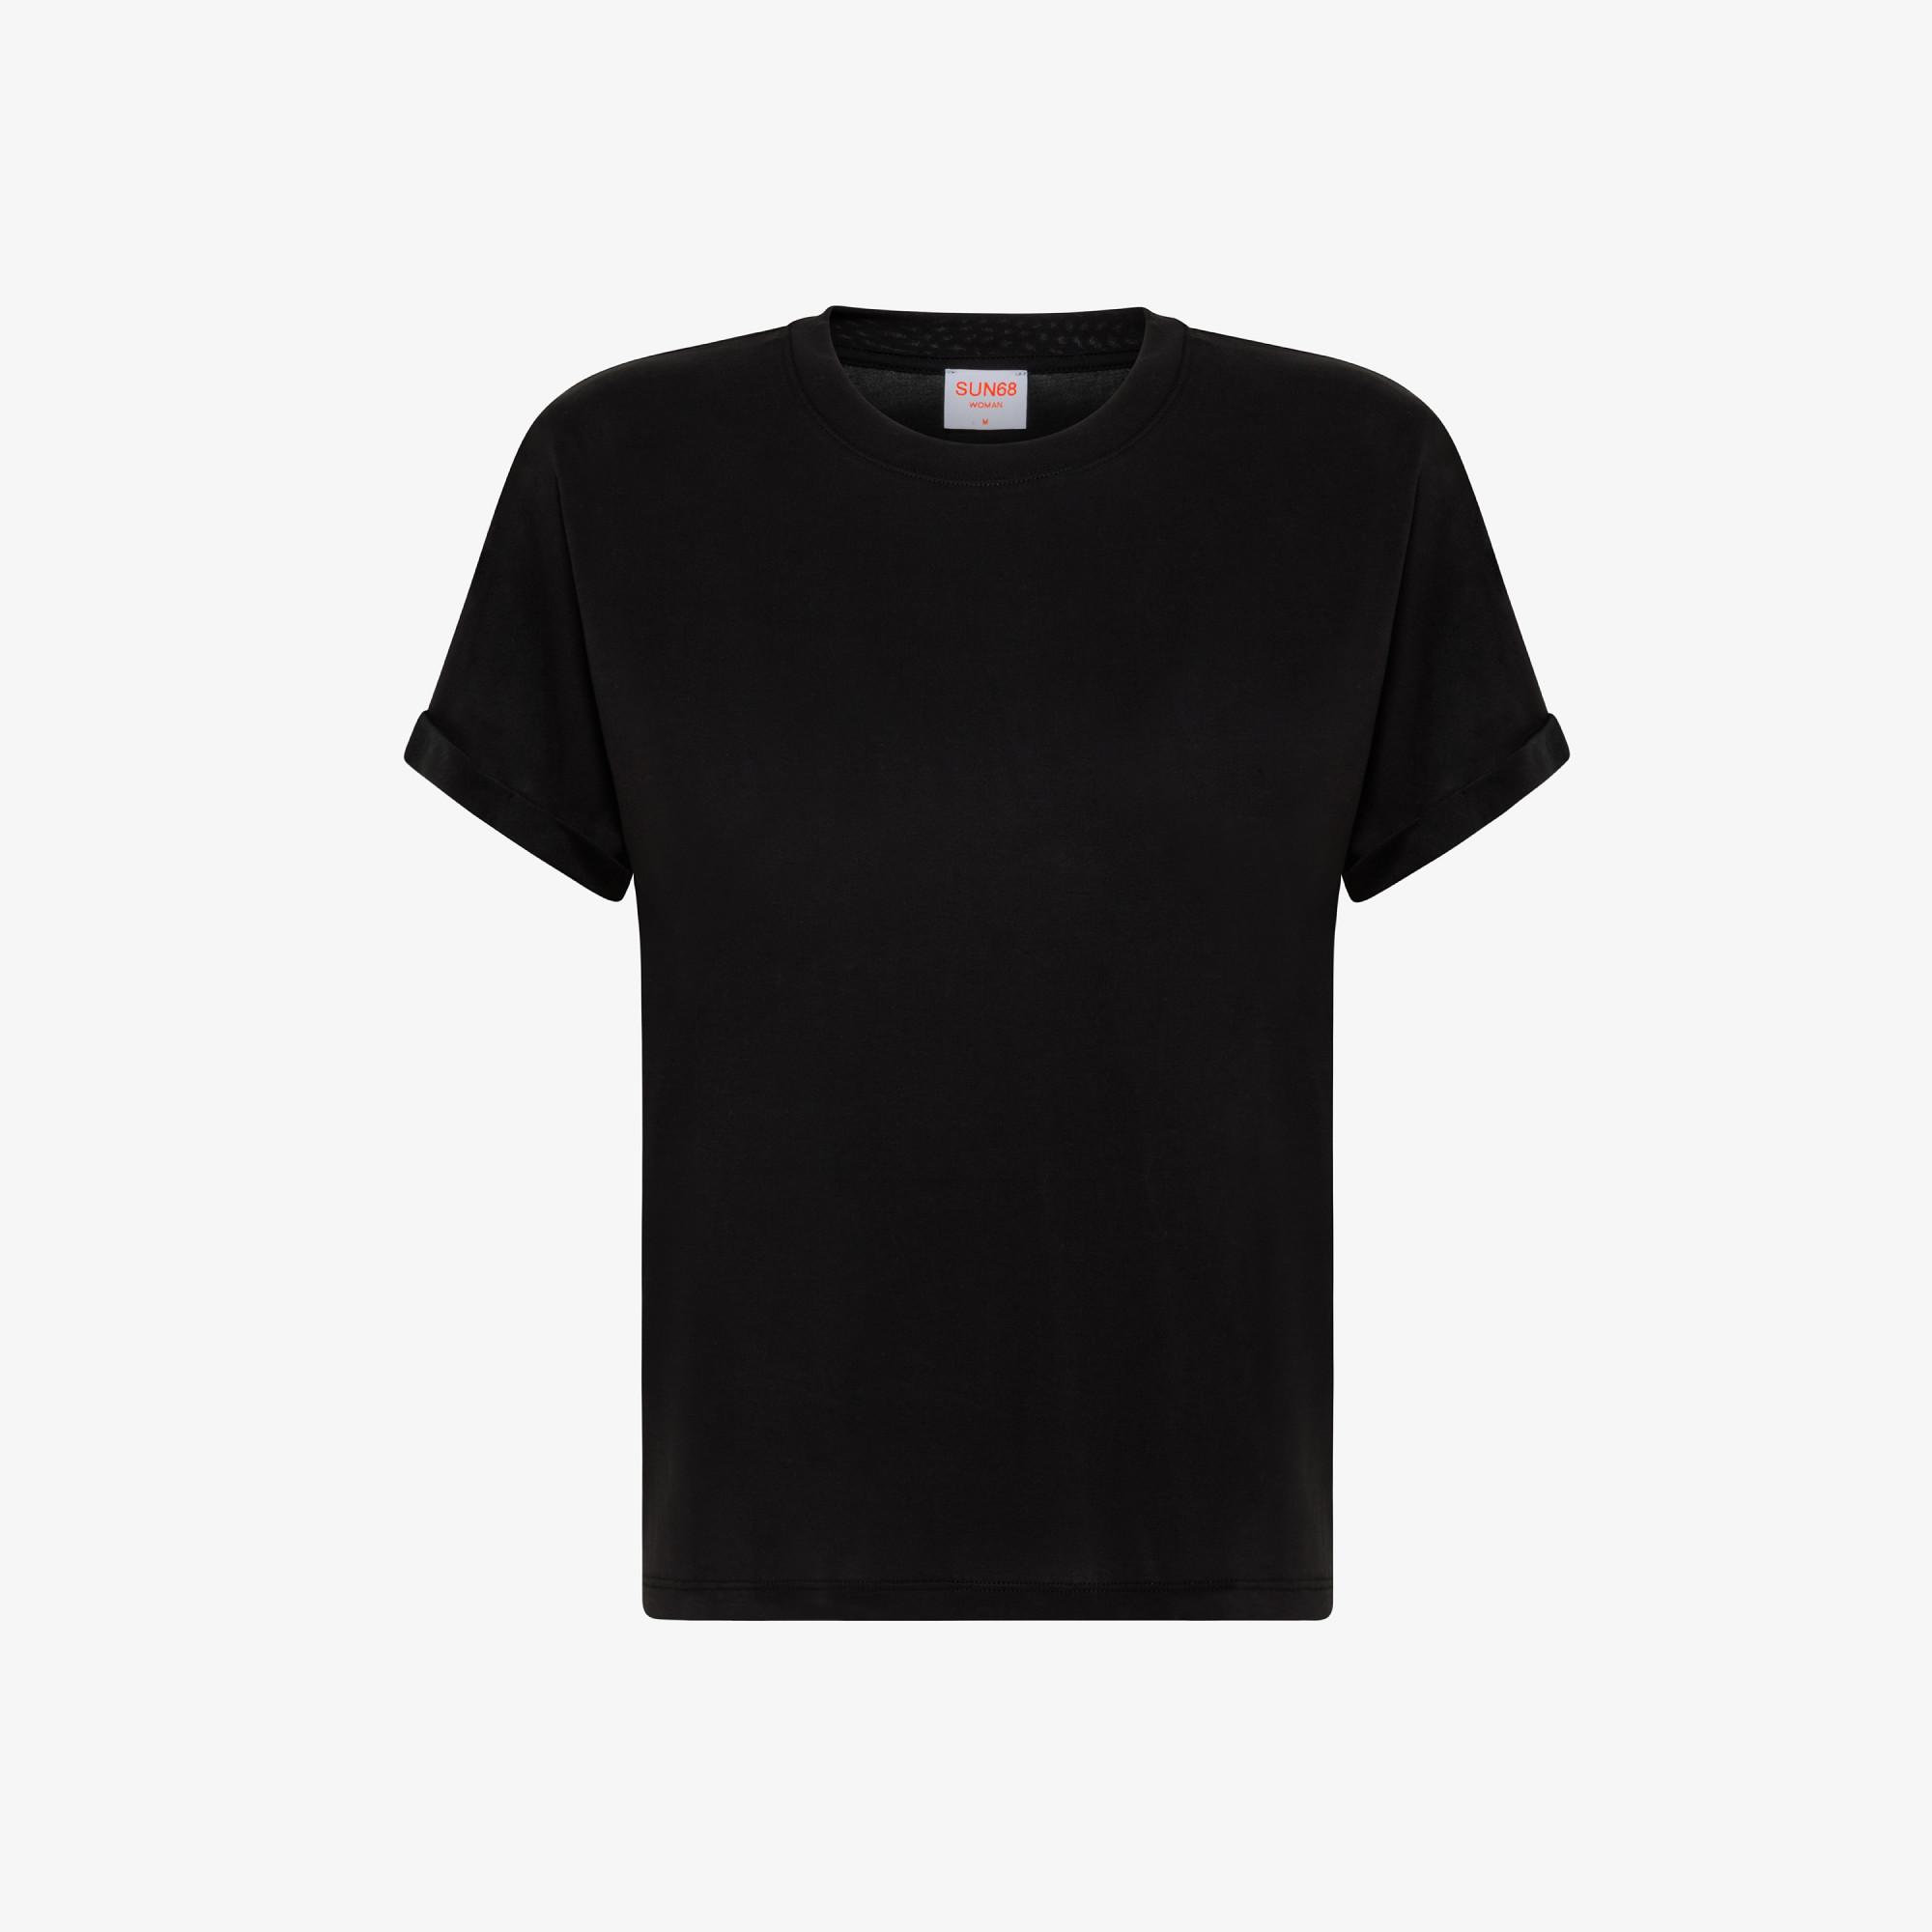 ROUND NECK T-SHIRT SHINY S/S BLACK